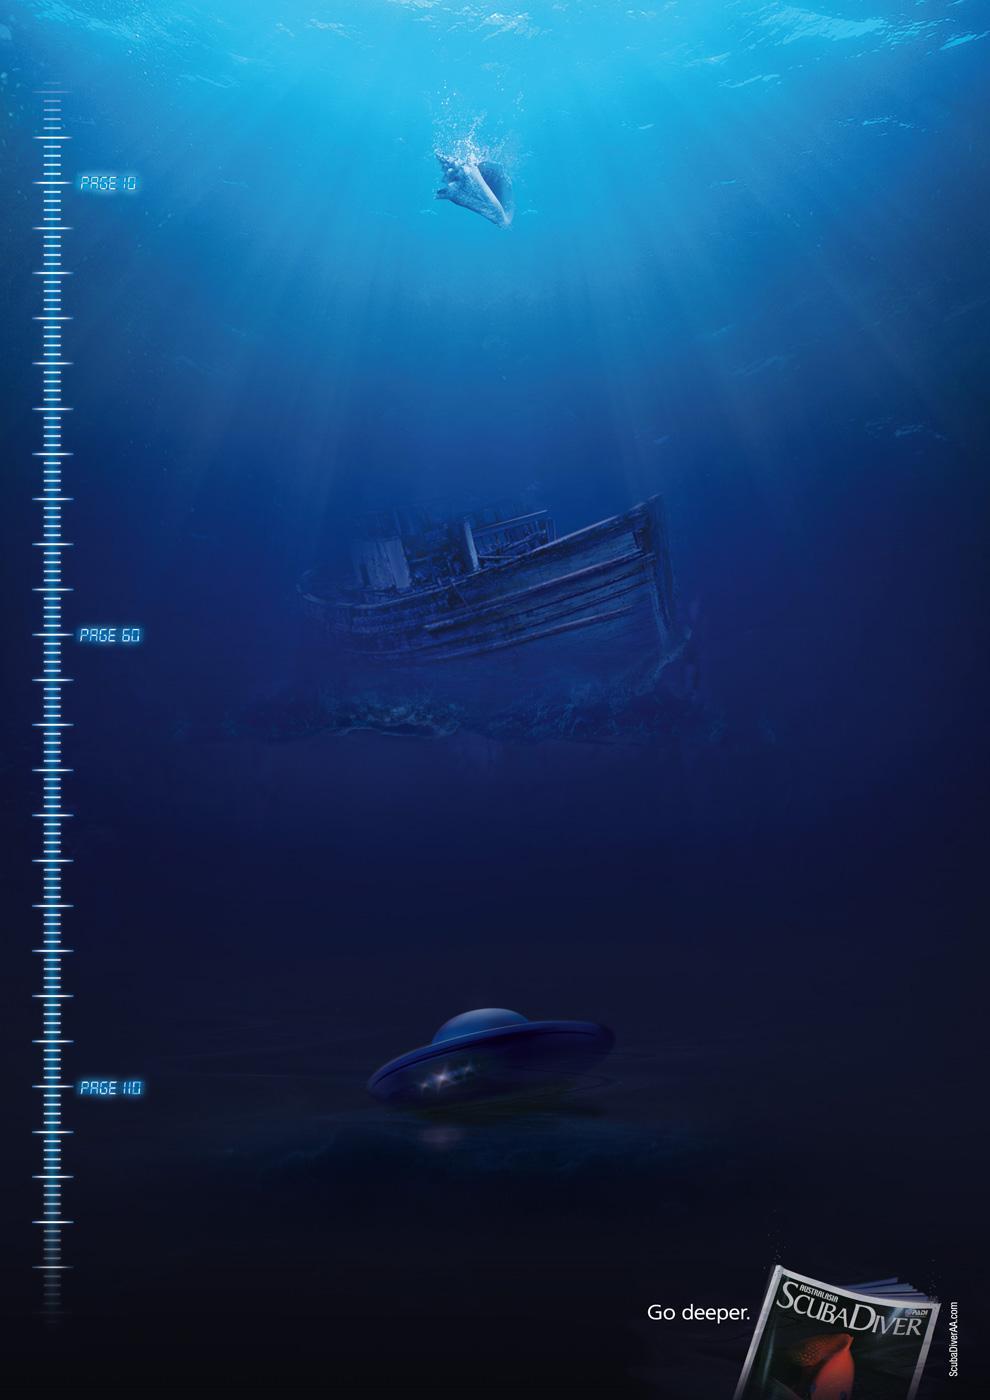 Scuba Diver Magazine Print Ad -  Broken Vessel of the Deep